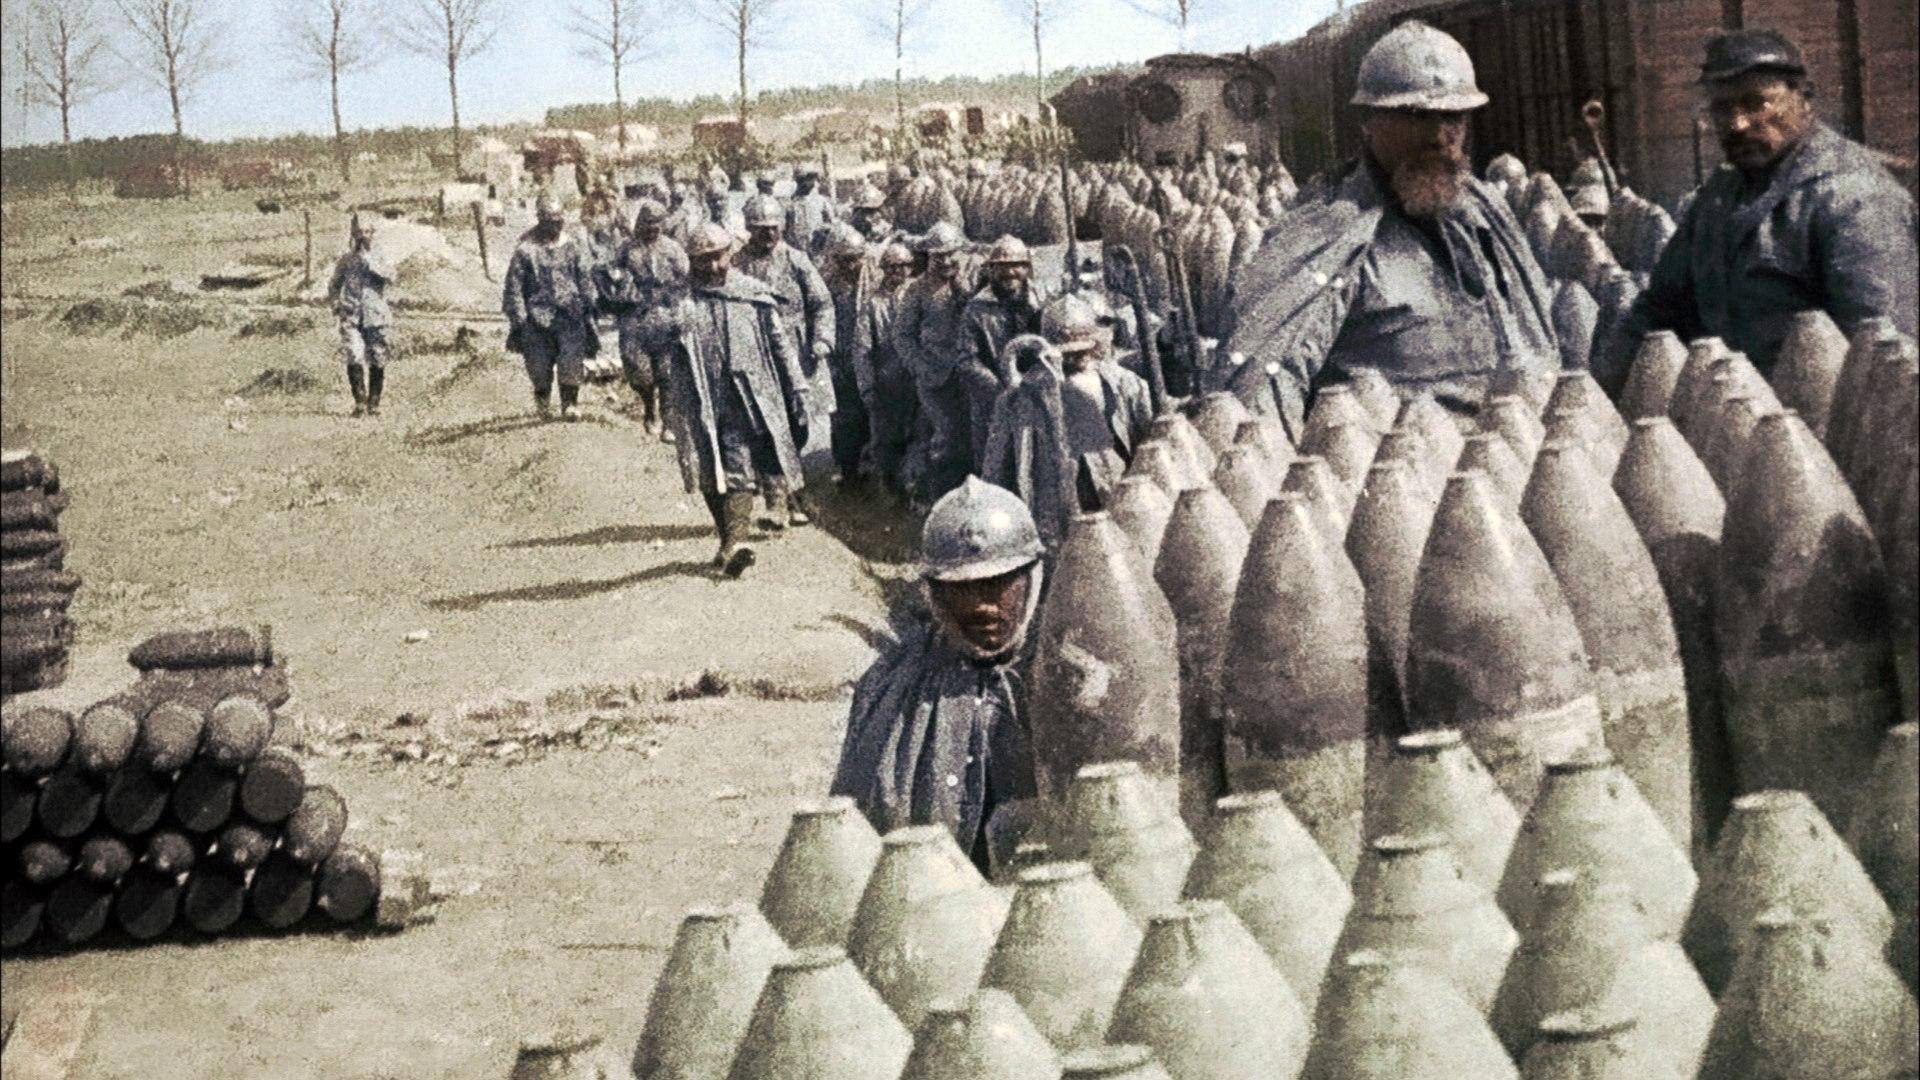 NationalGeo +1 14-18 La grande guerra